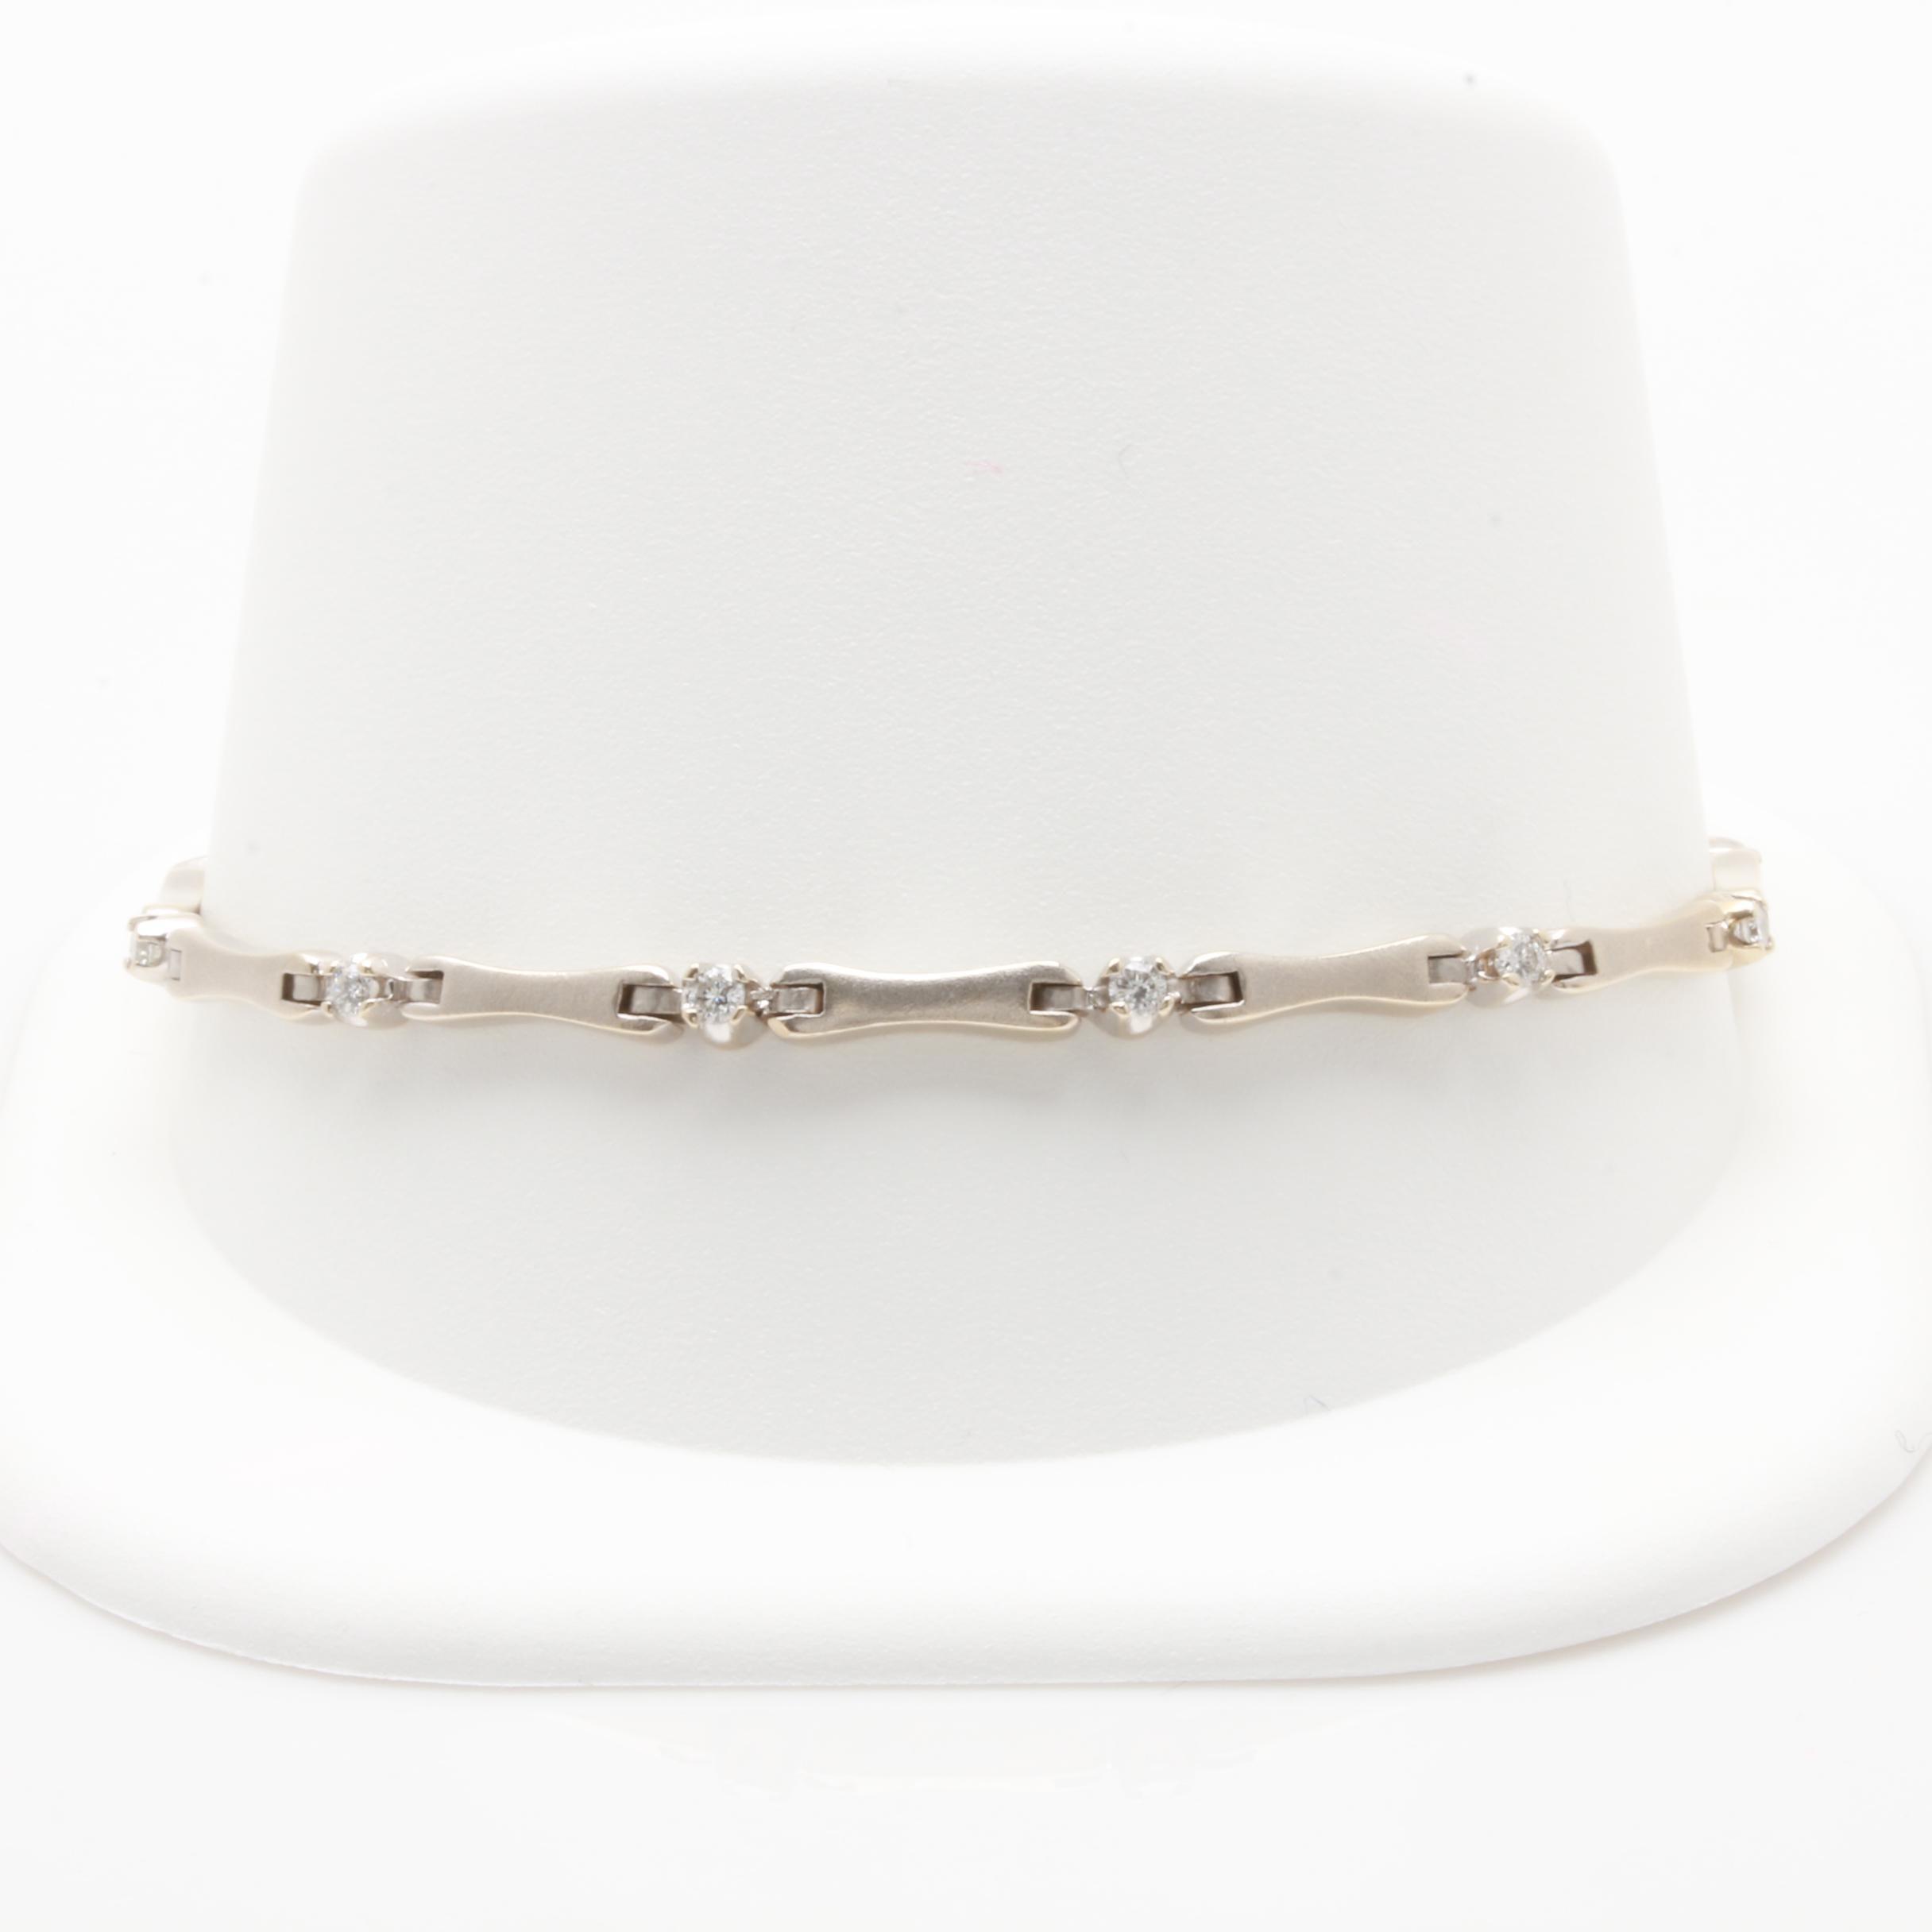 14K White Gold Diamond Link Bracelet